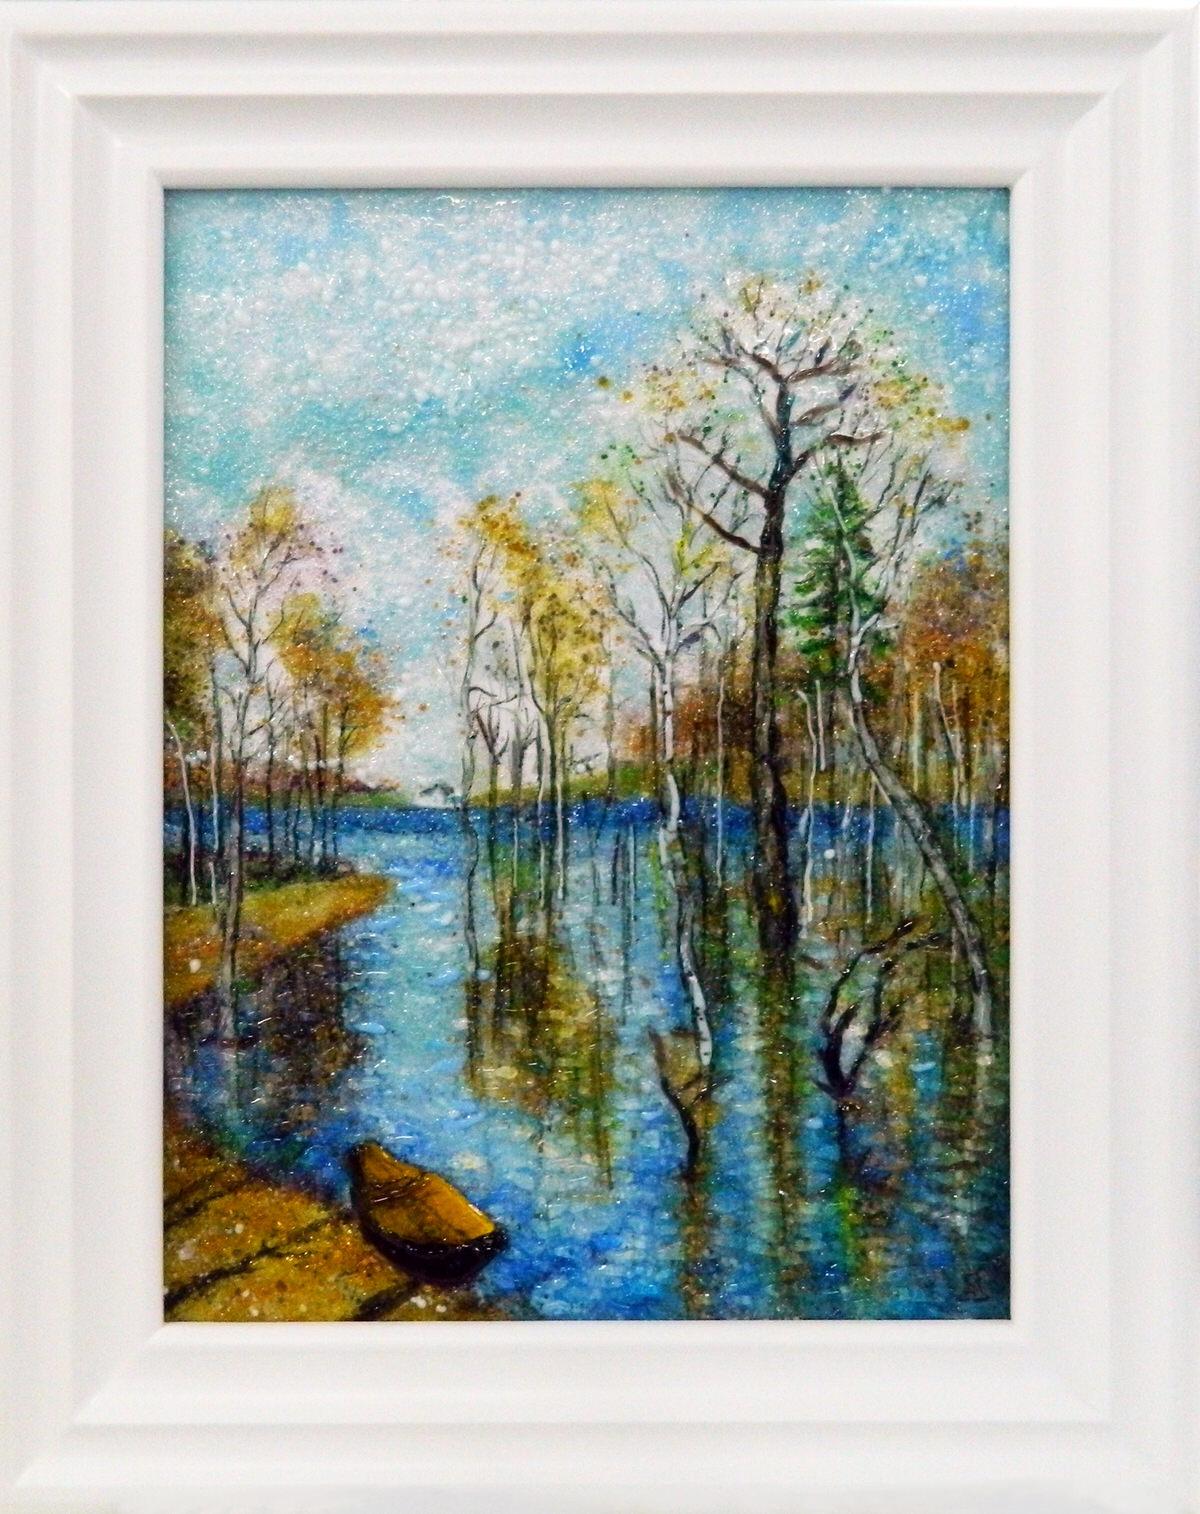 Исаак Левитан - Большая вода